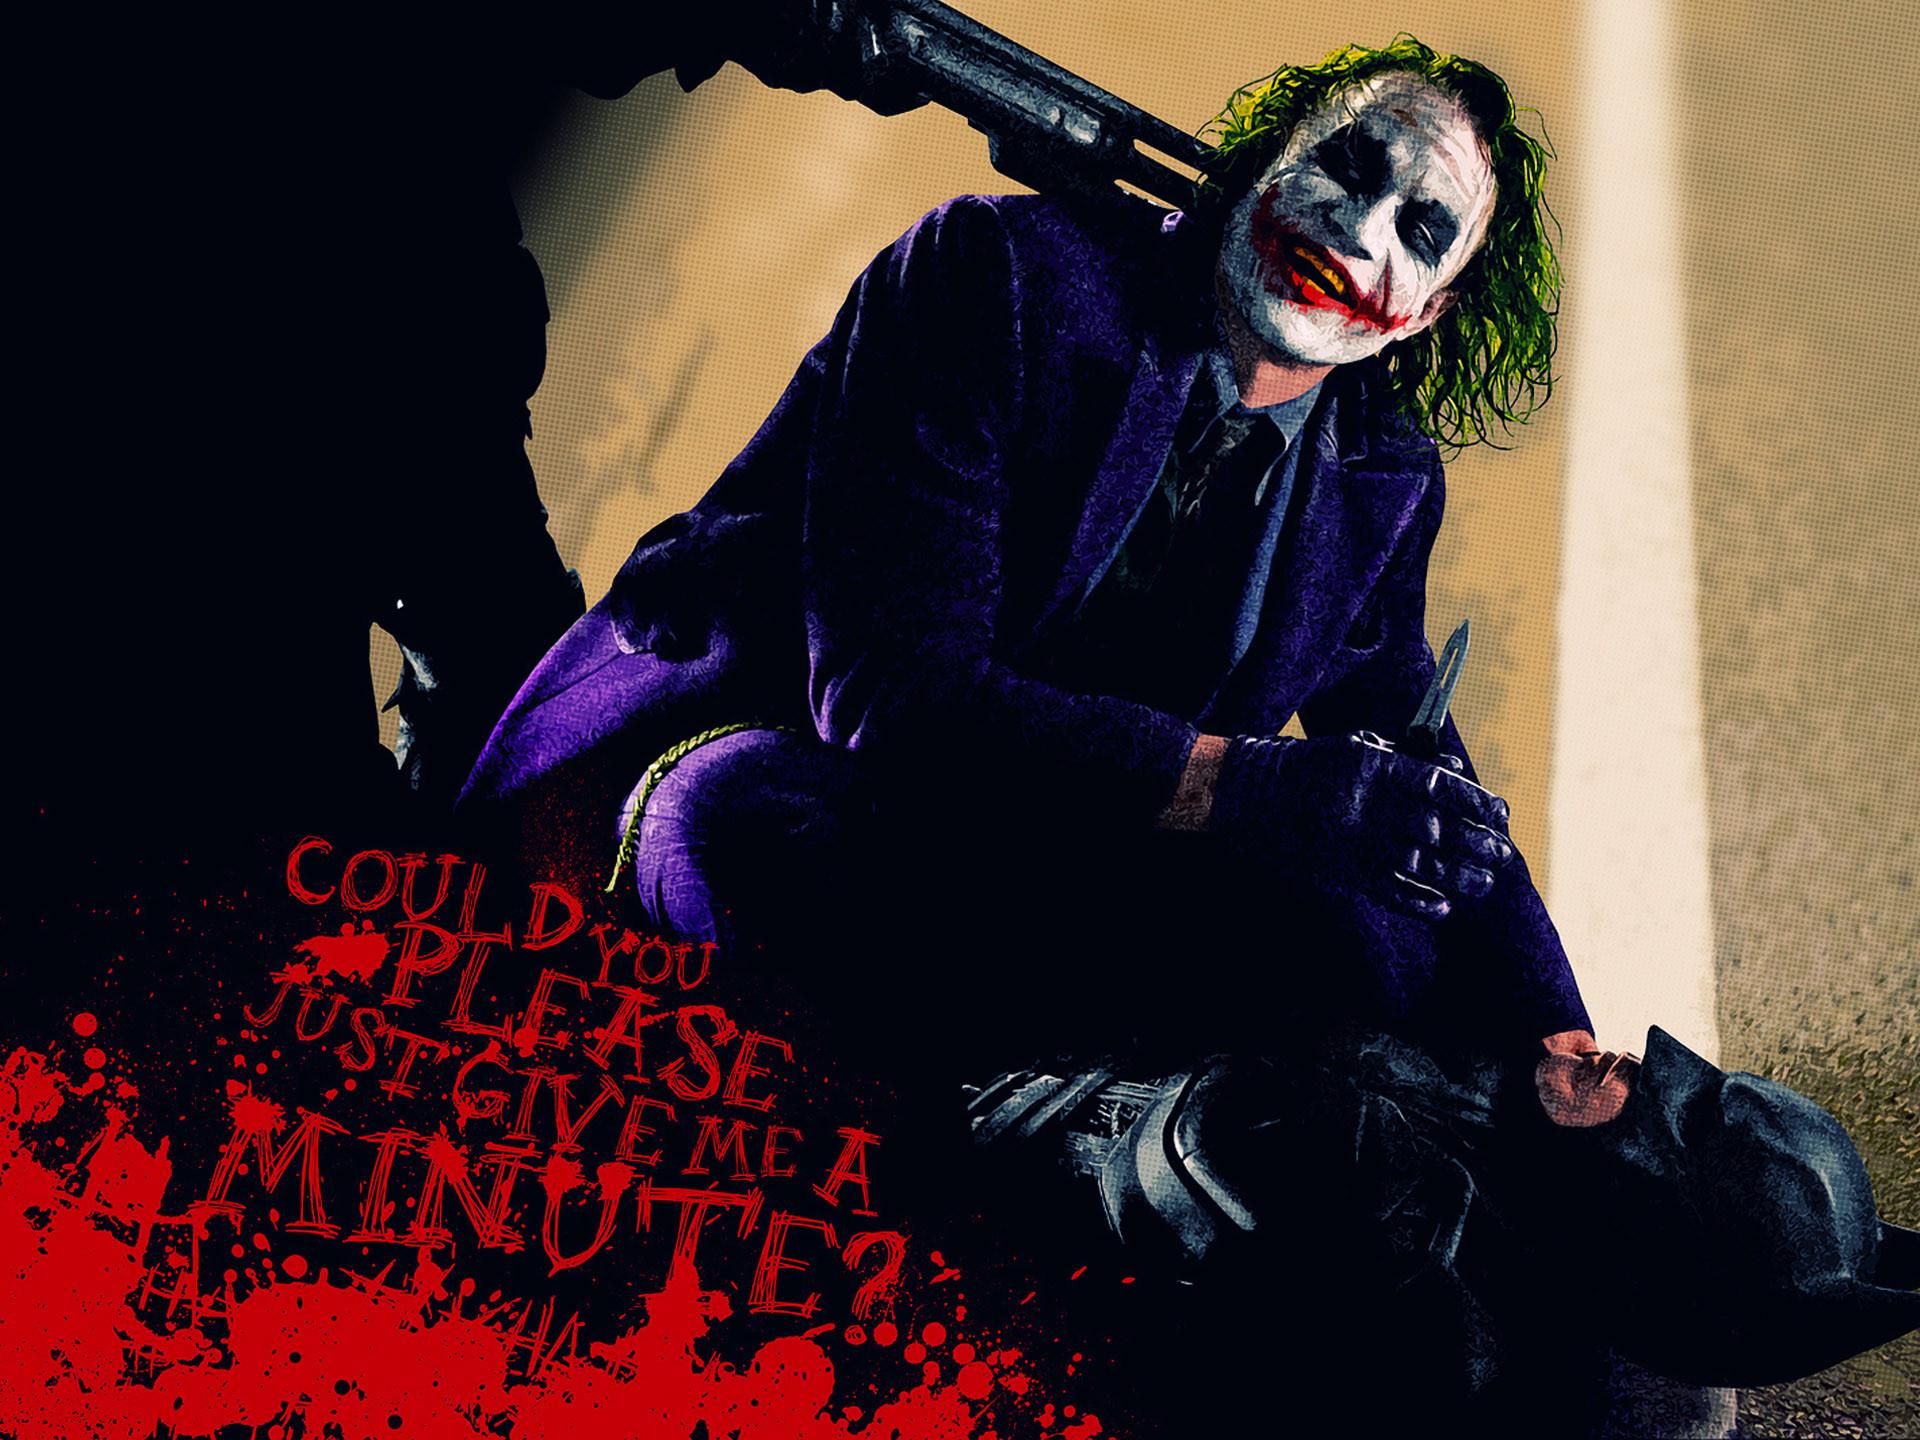 Joker wallpaper hd 1080p 81 immagini for Immagini joker hd